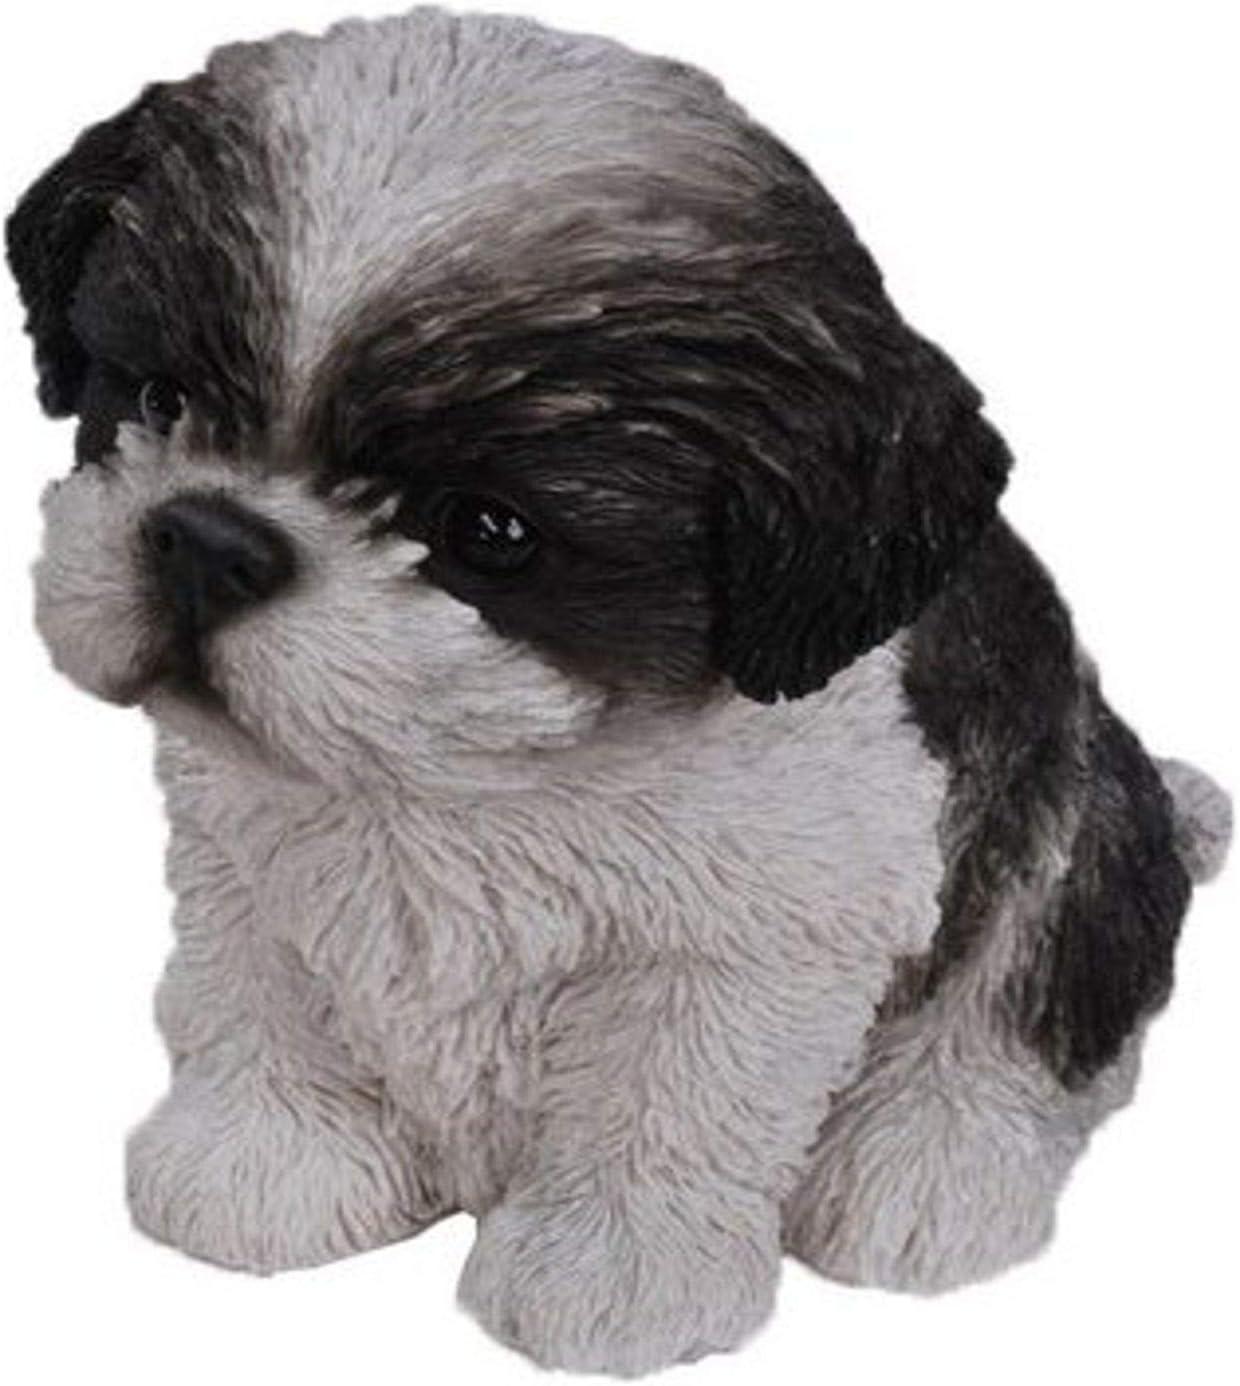 Shih Tzu Puppy Statue | Animal Statue for Home Decor, Garden Decor, Outdoor Decoration | Brown - 3.3'' H x 4.6'' W x 7'' D